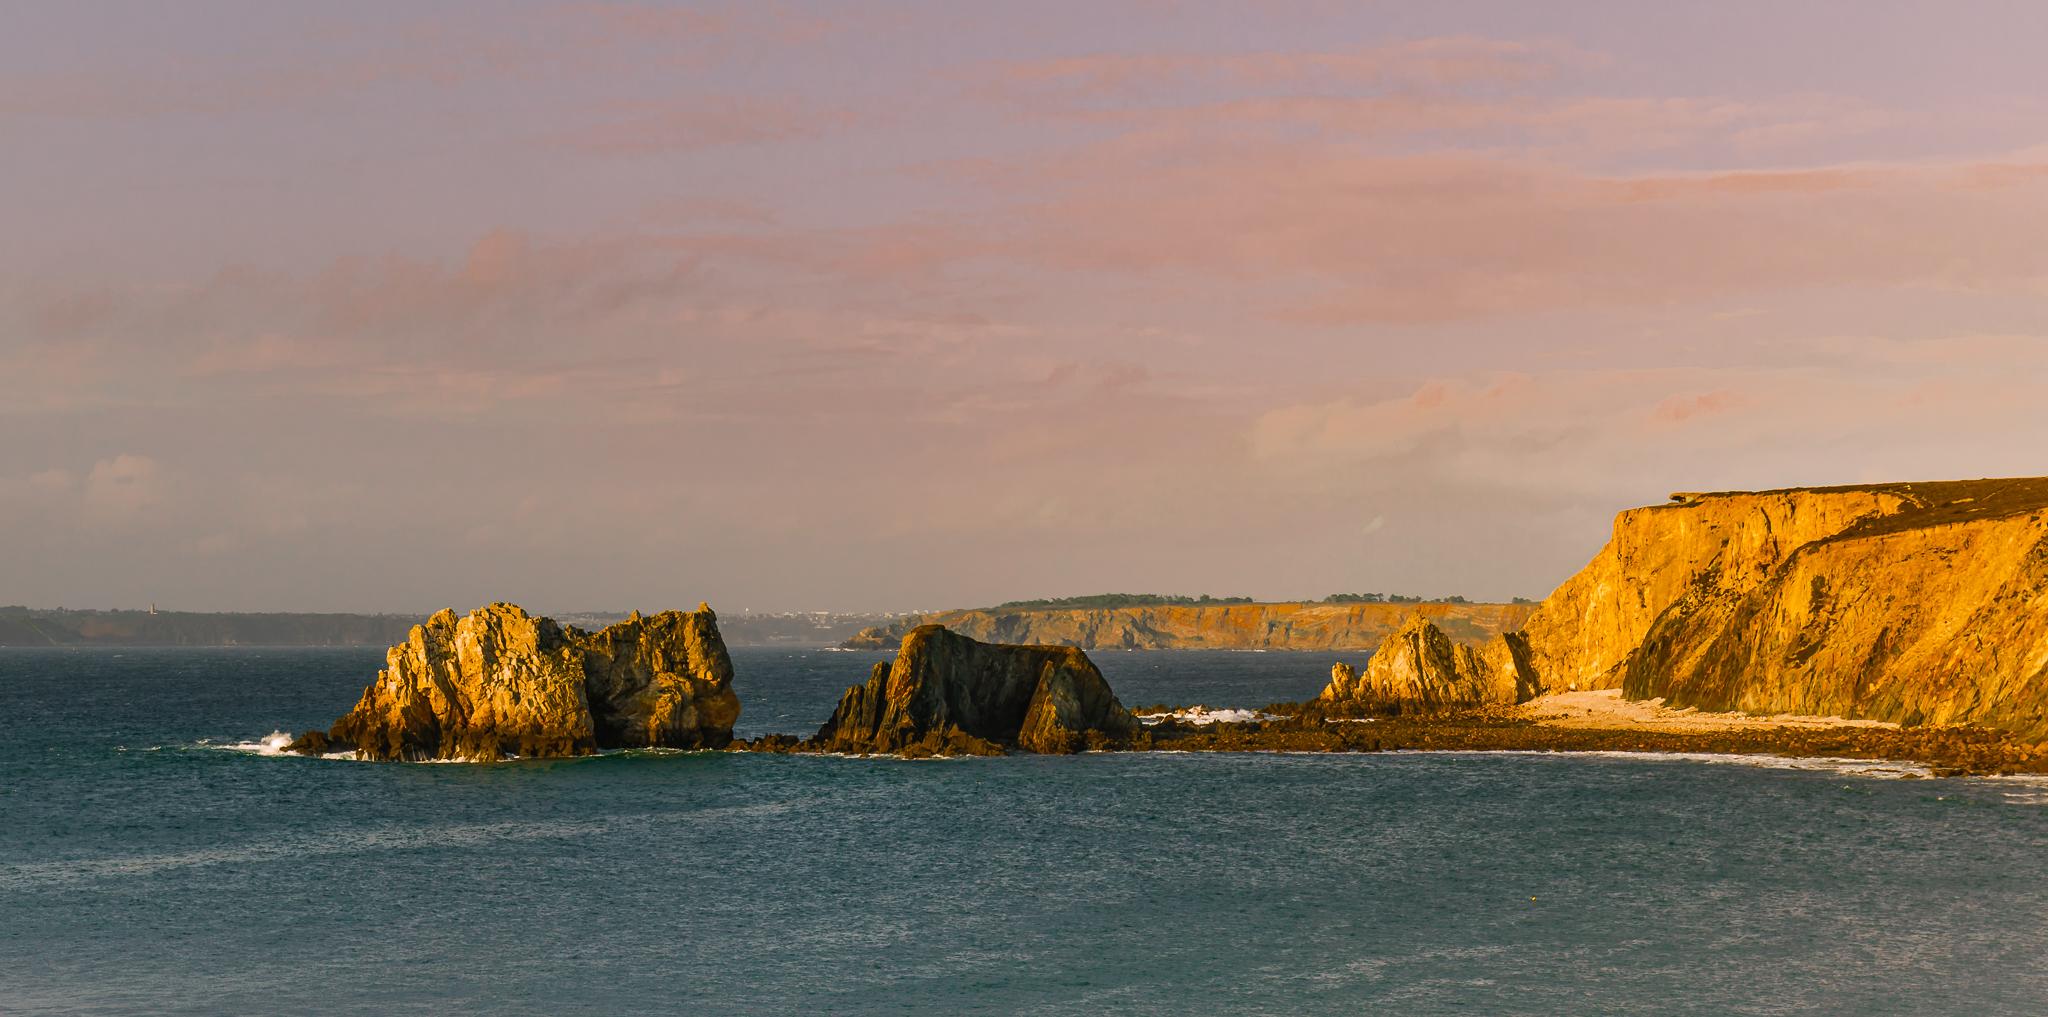 Seastacks catching the last golden light, France